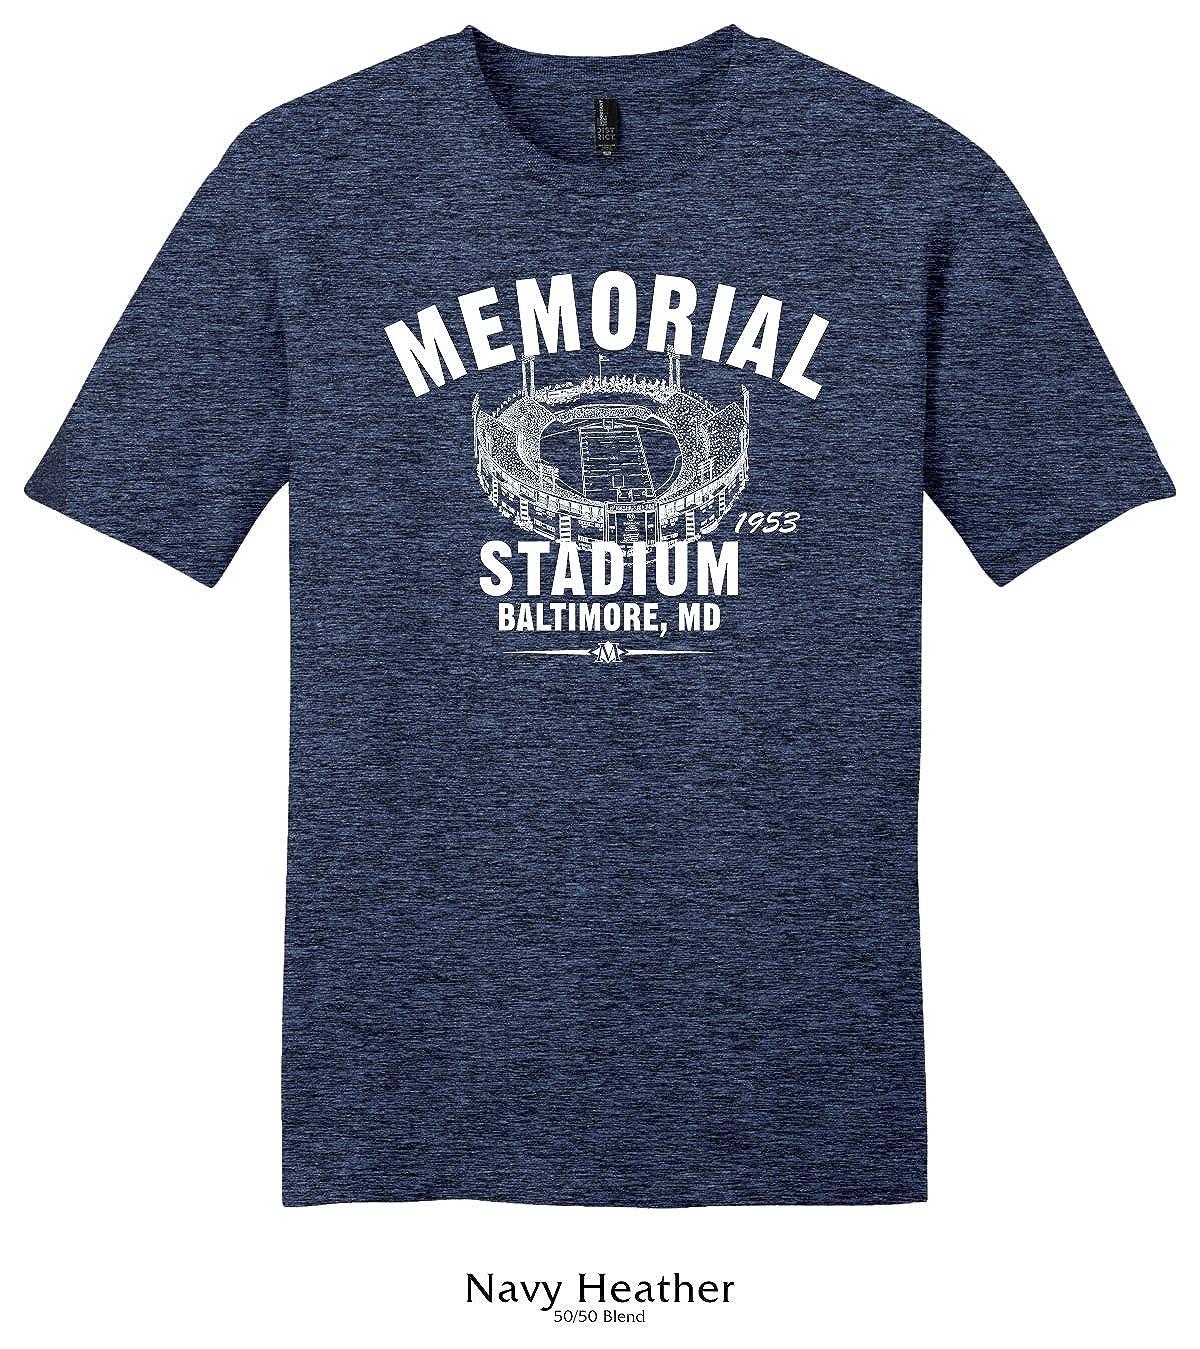 Throwbackmax 1953 Memorial Stadium Baltimore Colts Football Tee Shirt